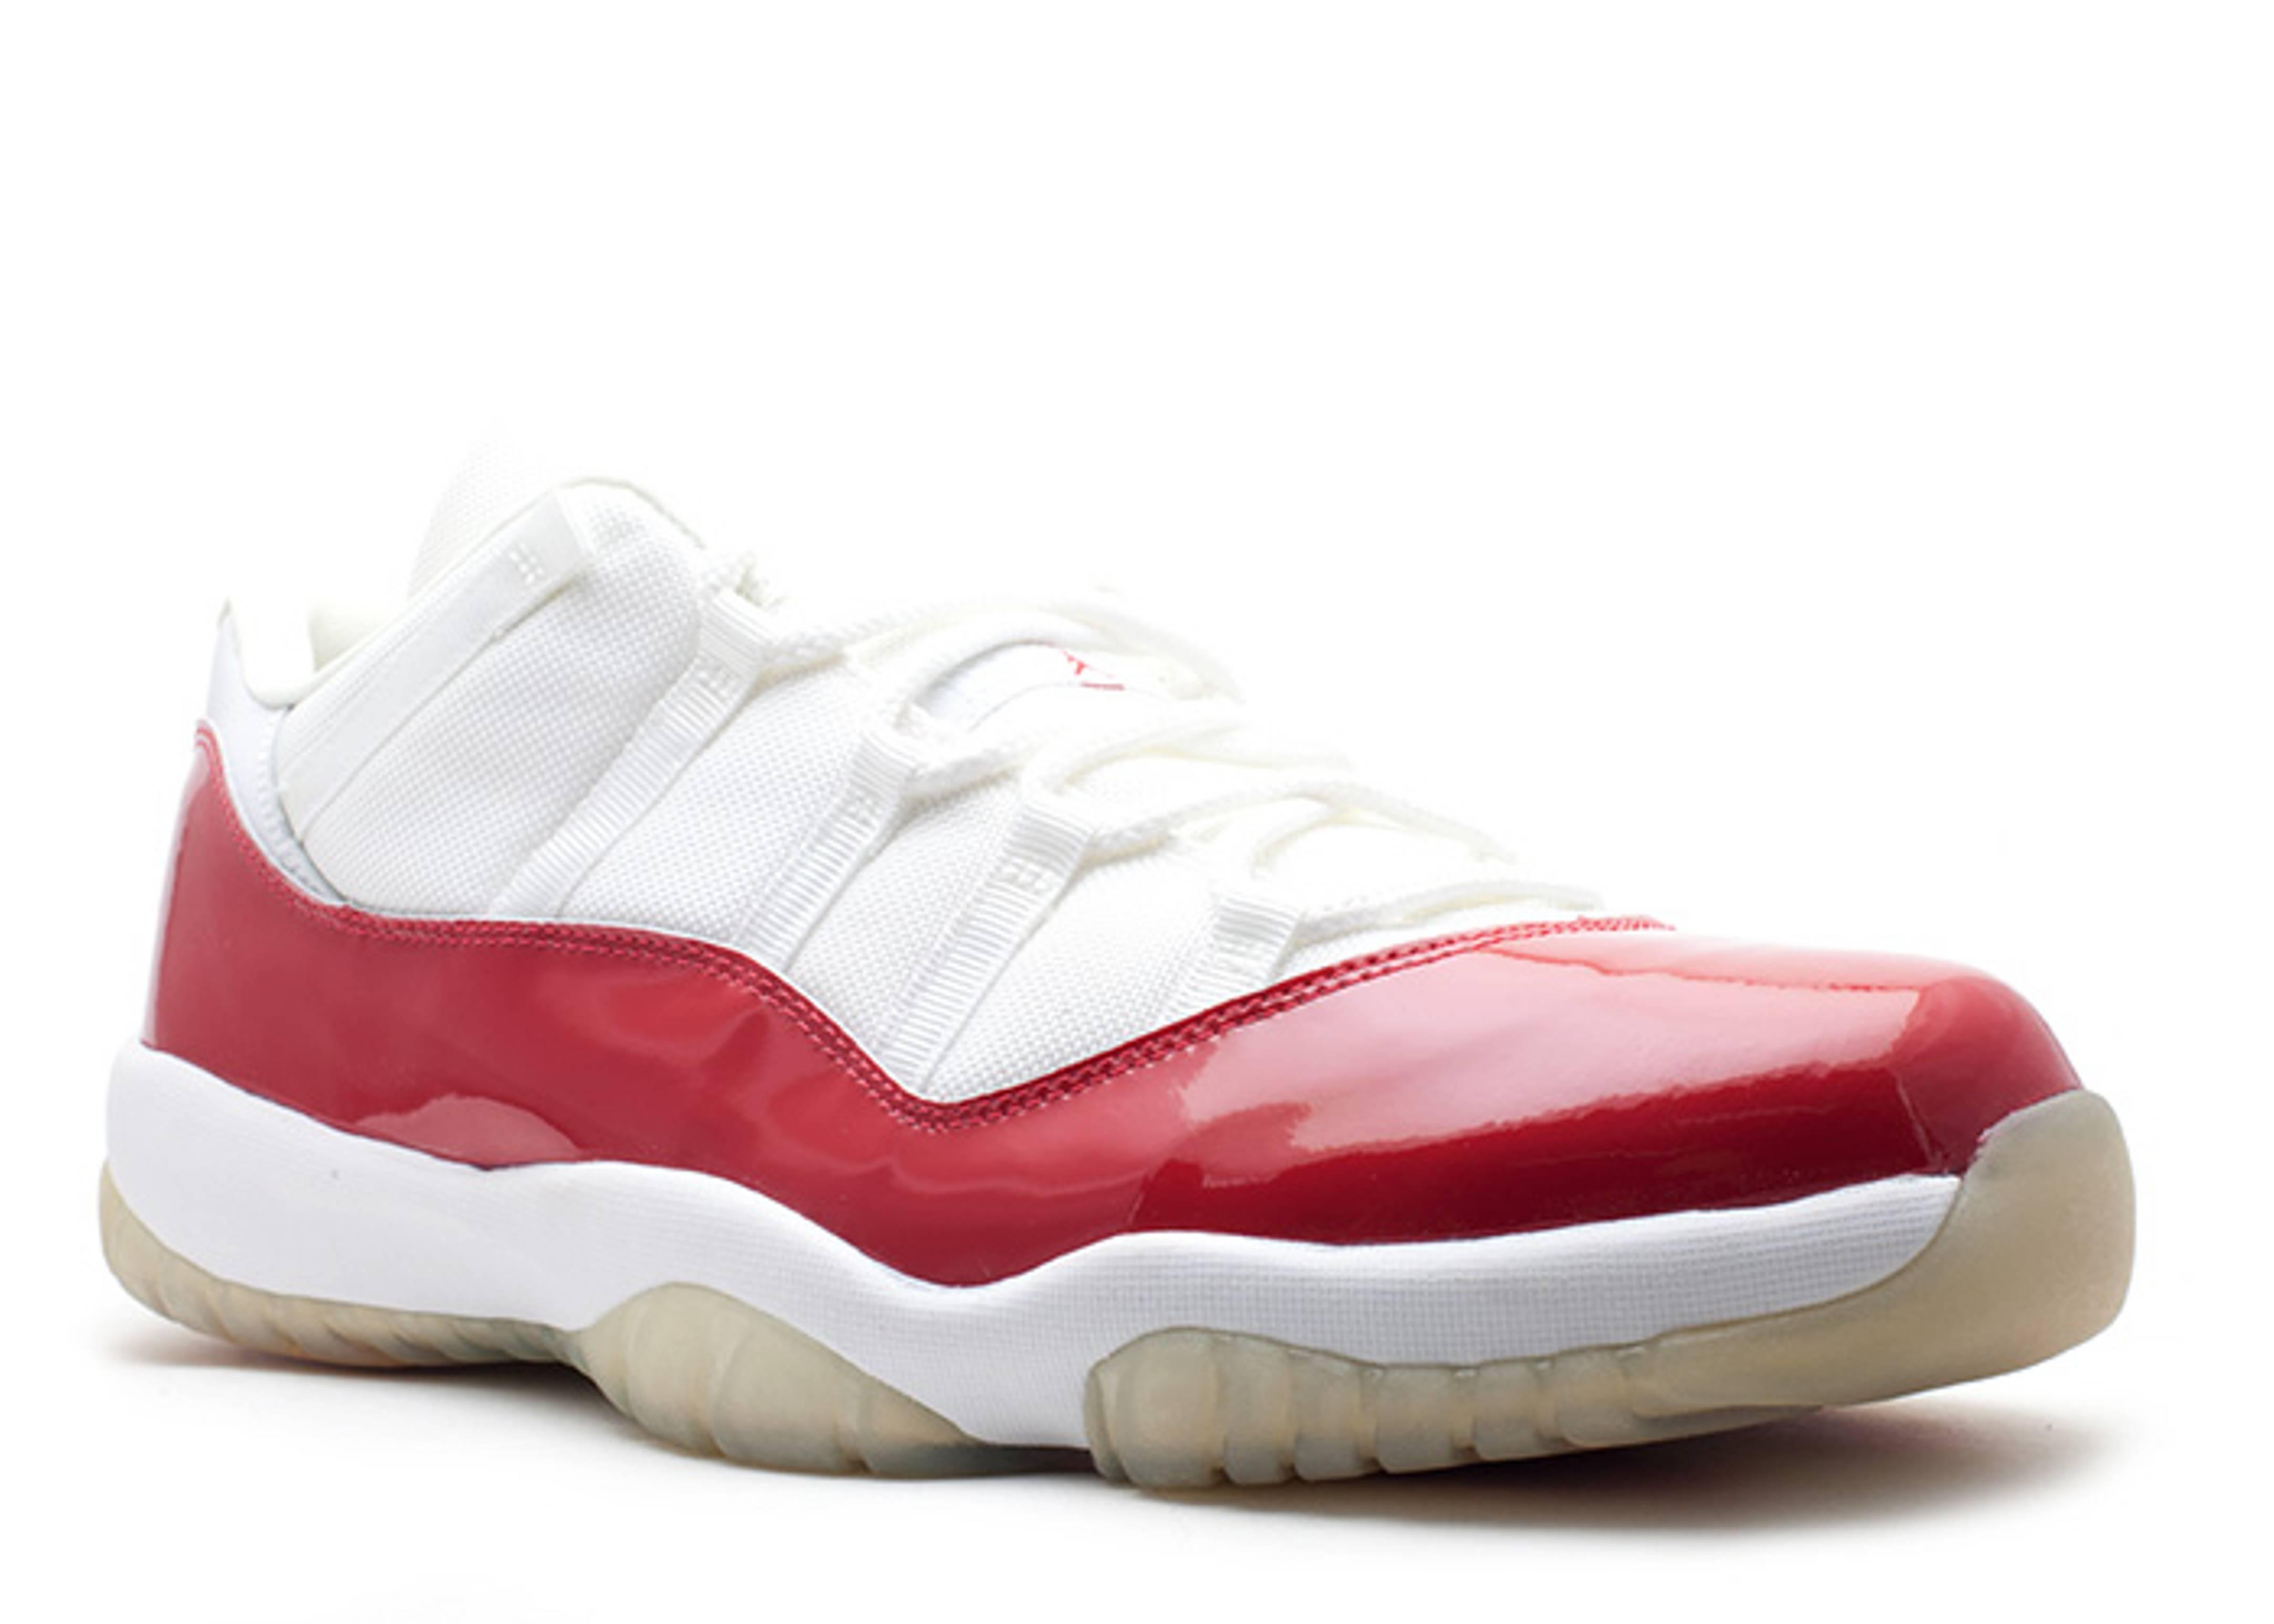 dbd4abe3381f Air Jordan 11 Retro Low - Air Jordan - 136053 161 - white varsity red